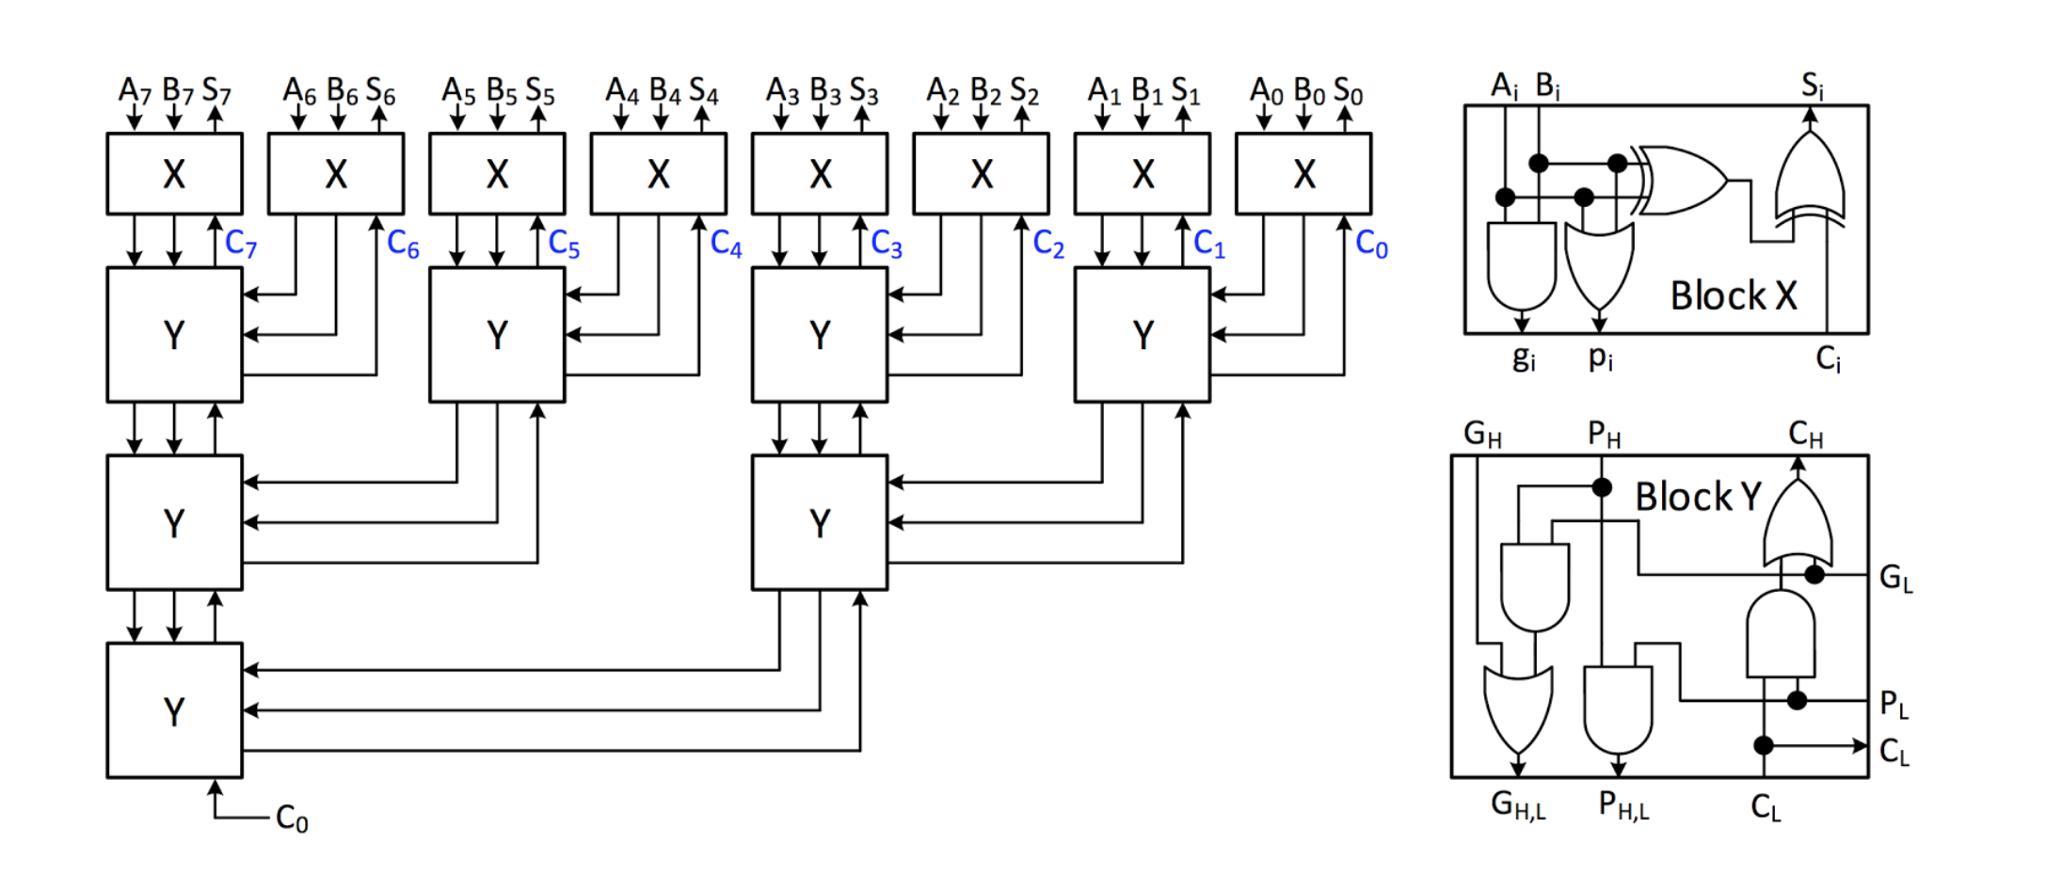 2 Bit Carry Look Ahead Adder Circuit Diagram